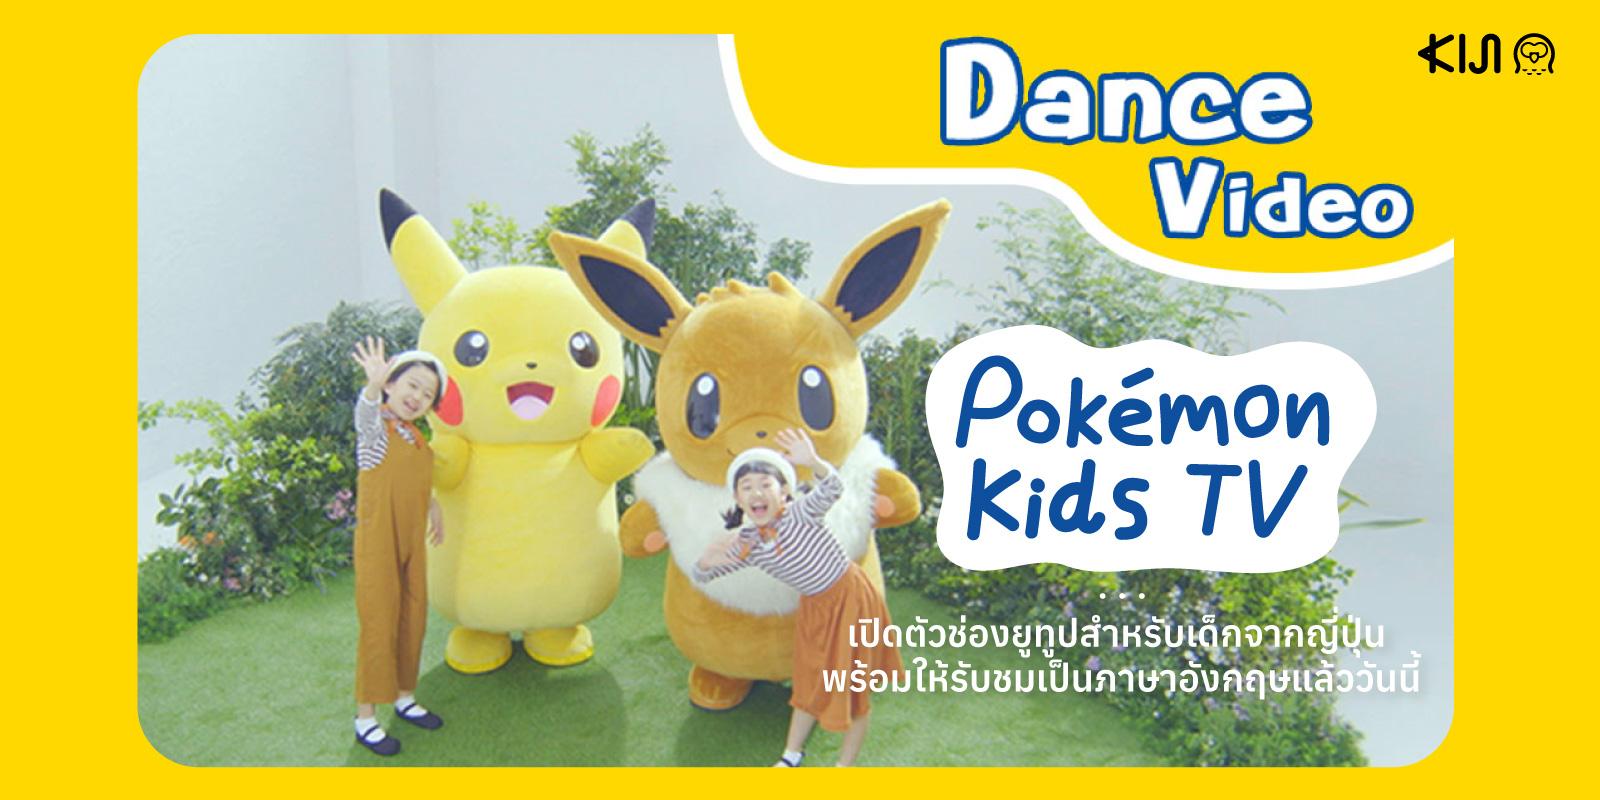 Pokemon Kids TV ช่องยูทูปจากญี่ปุ่นสุดน่ารัก